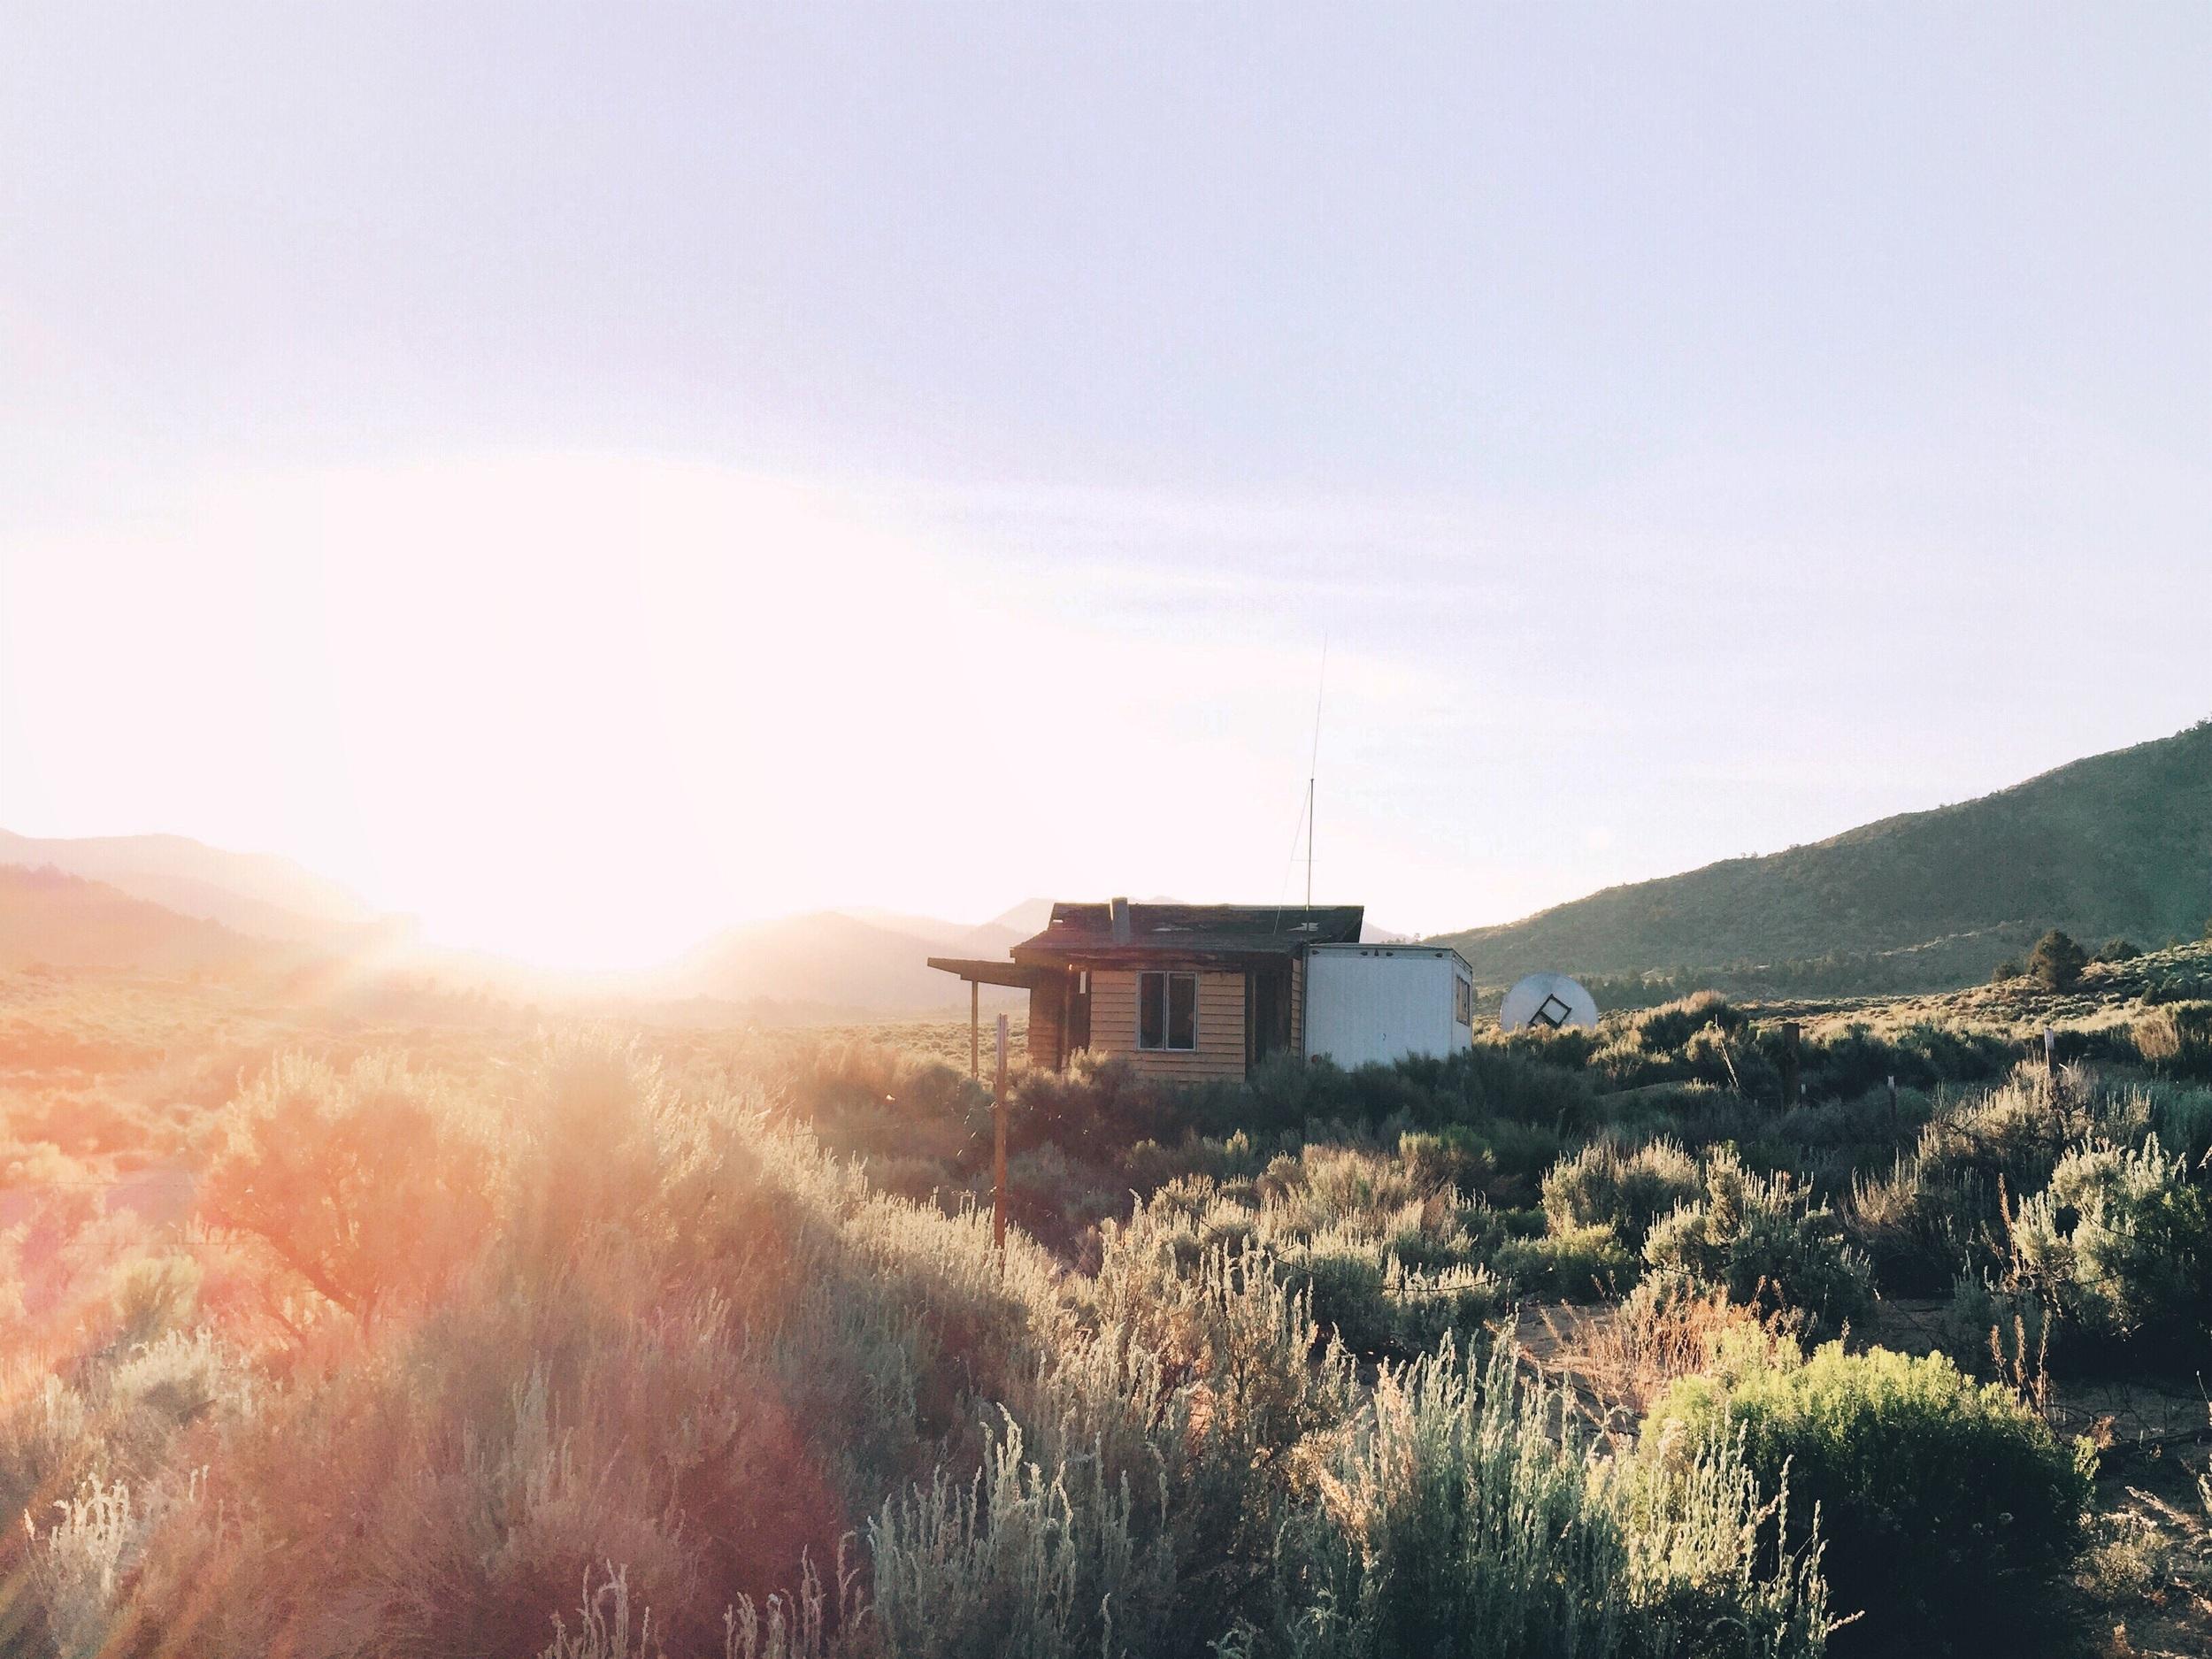 Sun peering through an abandoned shack.